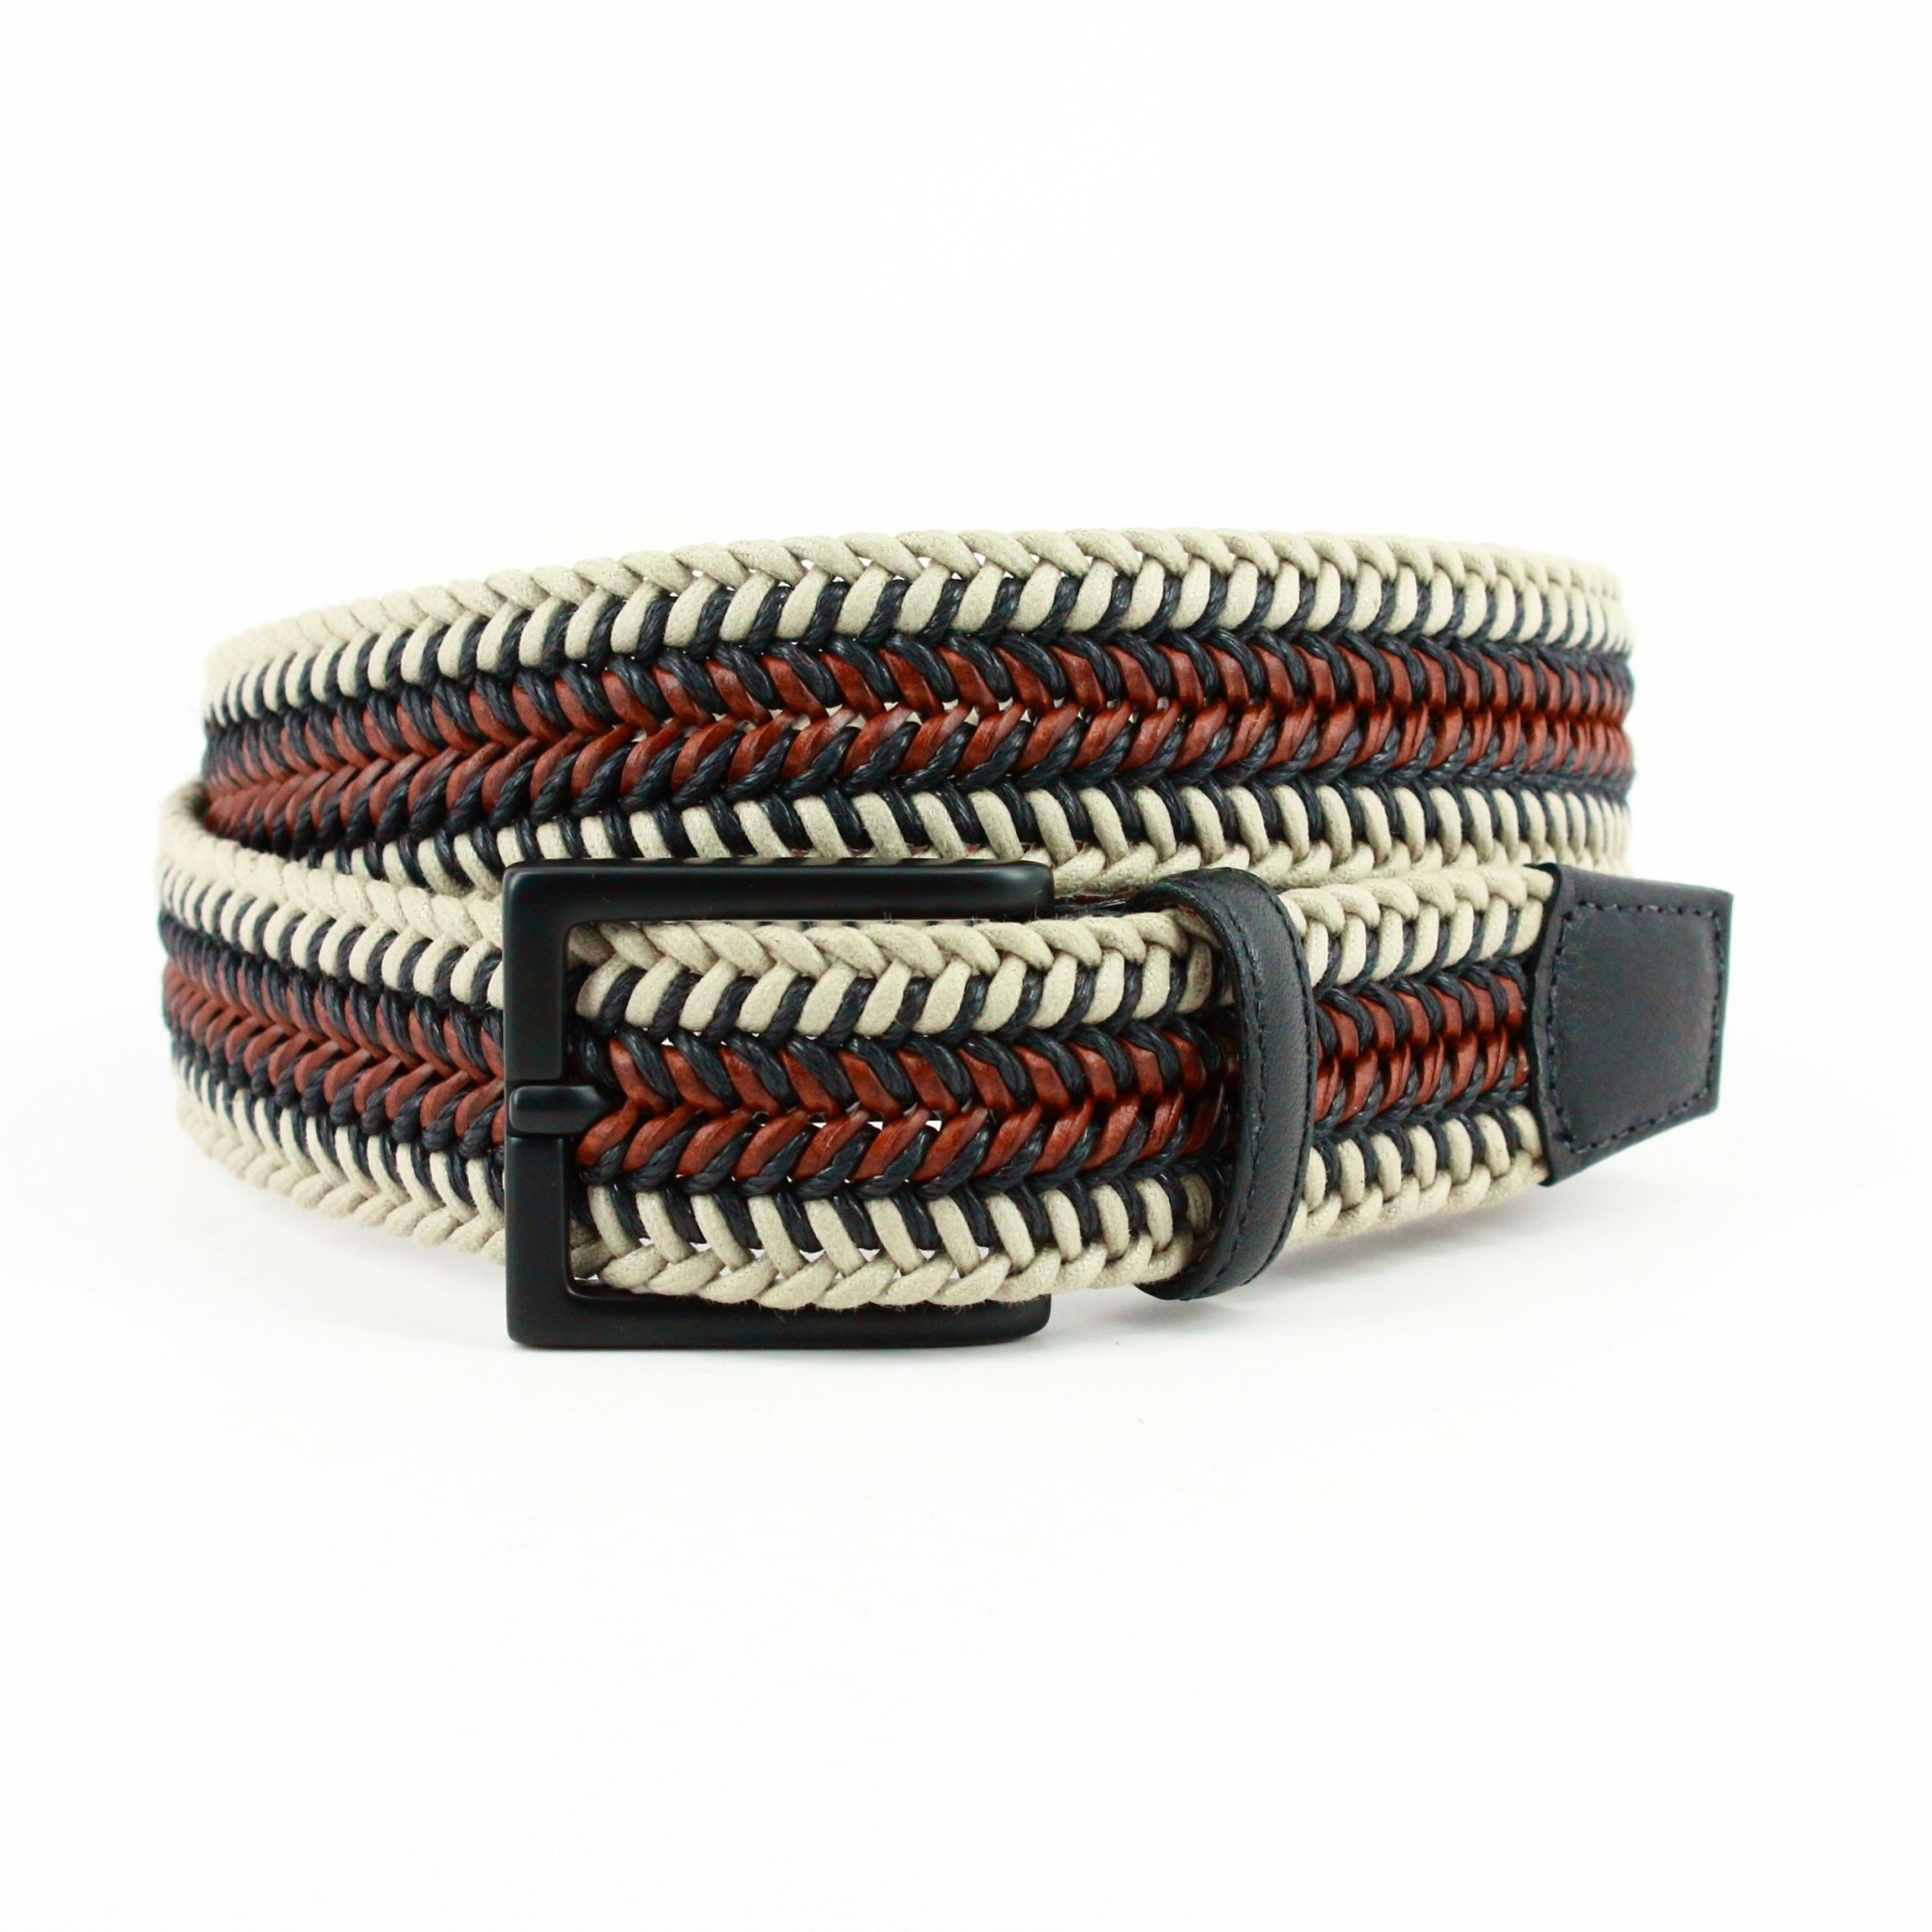 TORINO LEATHER COMPANY Torino Italian Leather & Cotton Belt